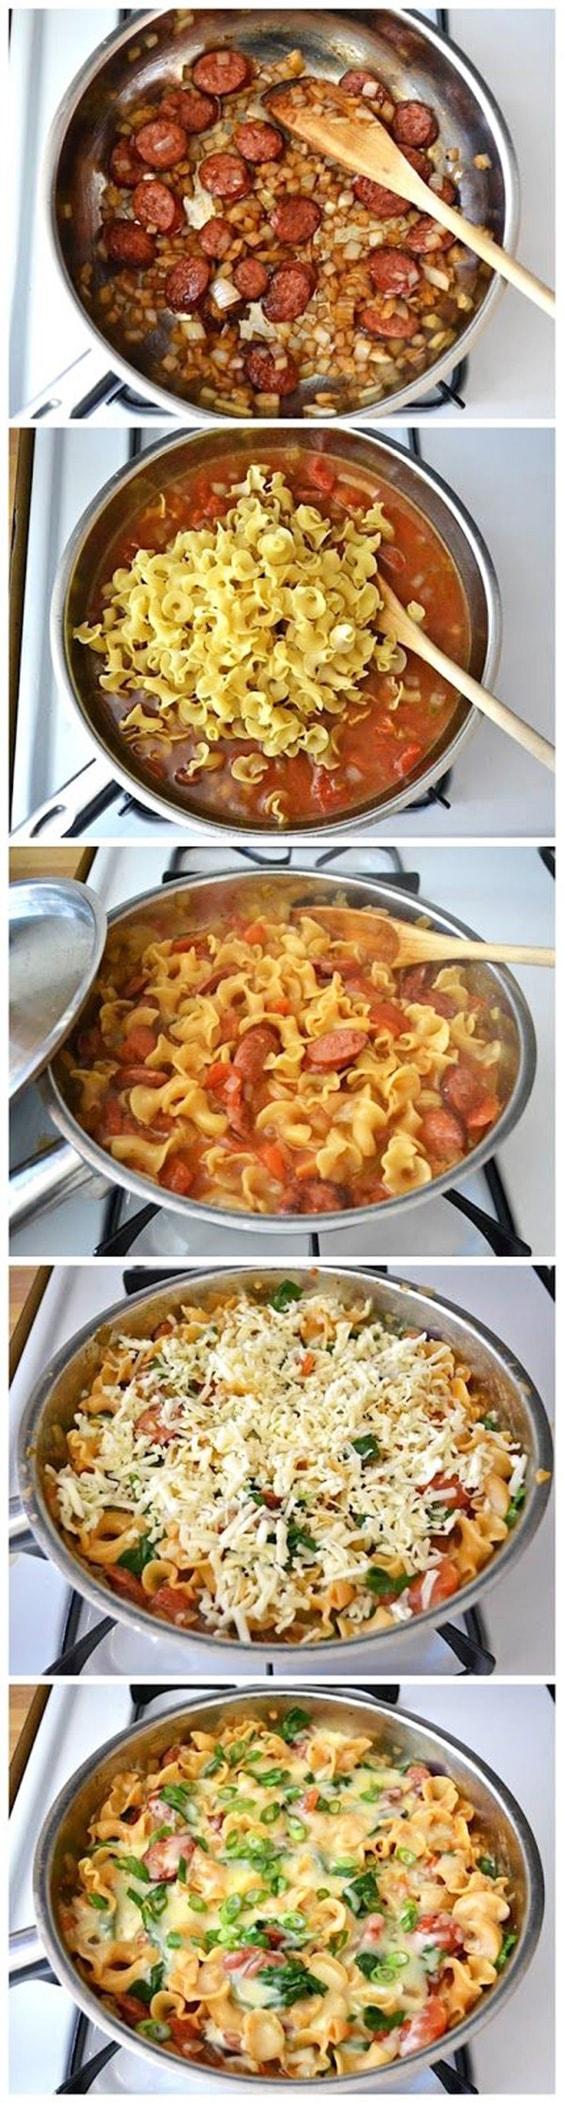 Creamy spinach sausage pasta